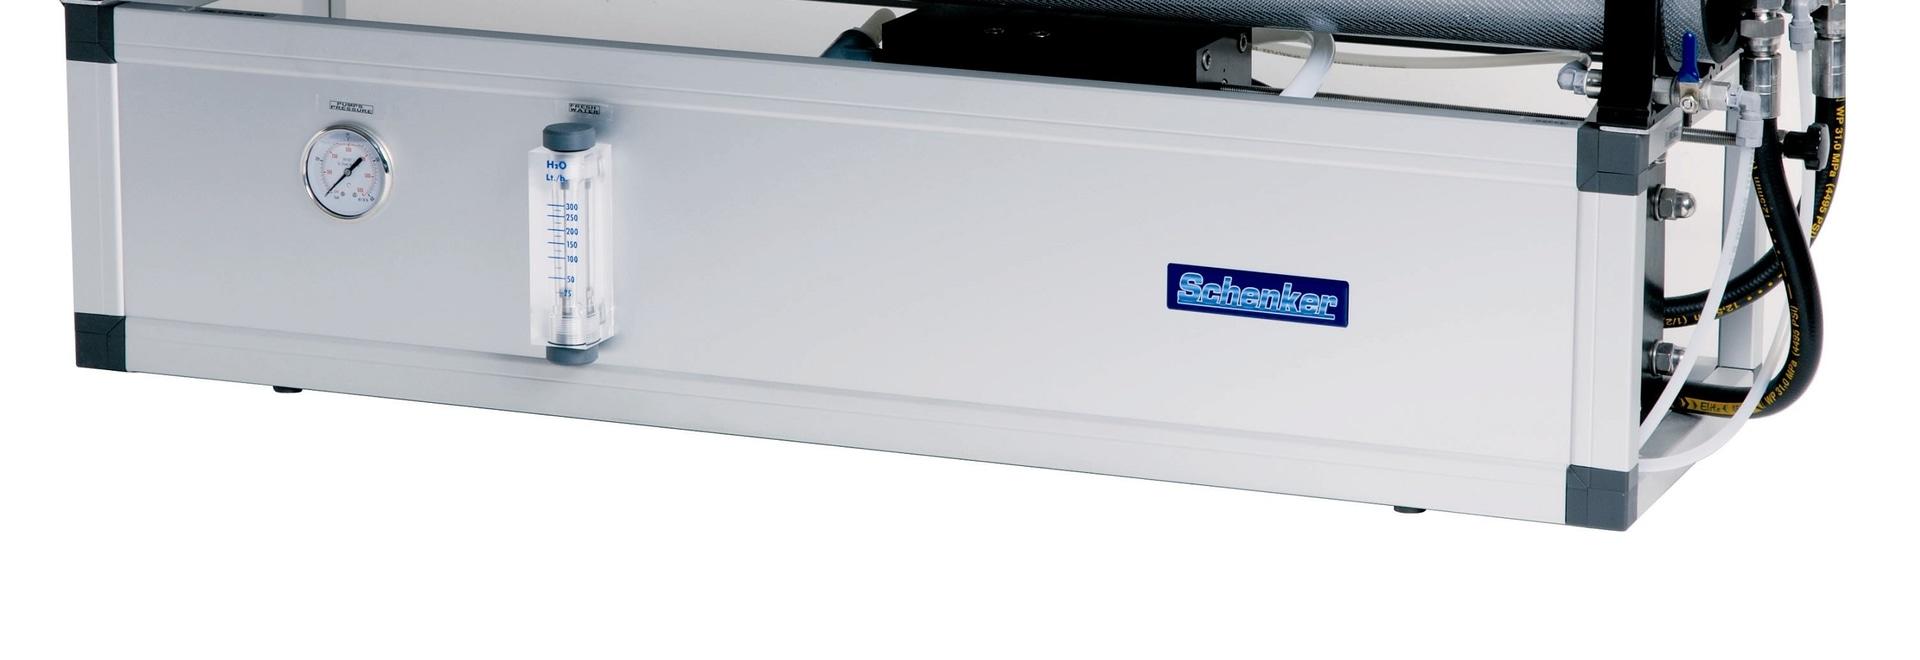 New watermaker Schenker 210 lit/h  5 tons/day Digital version